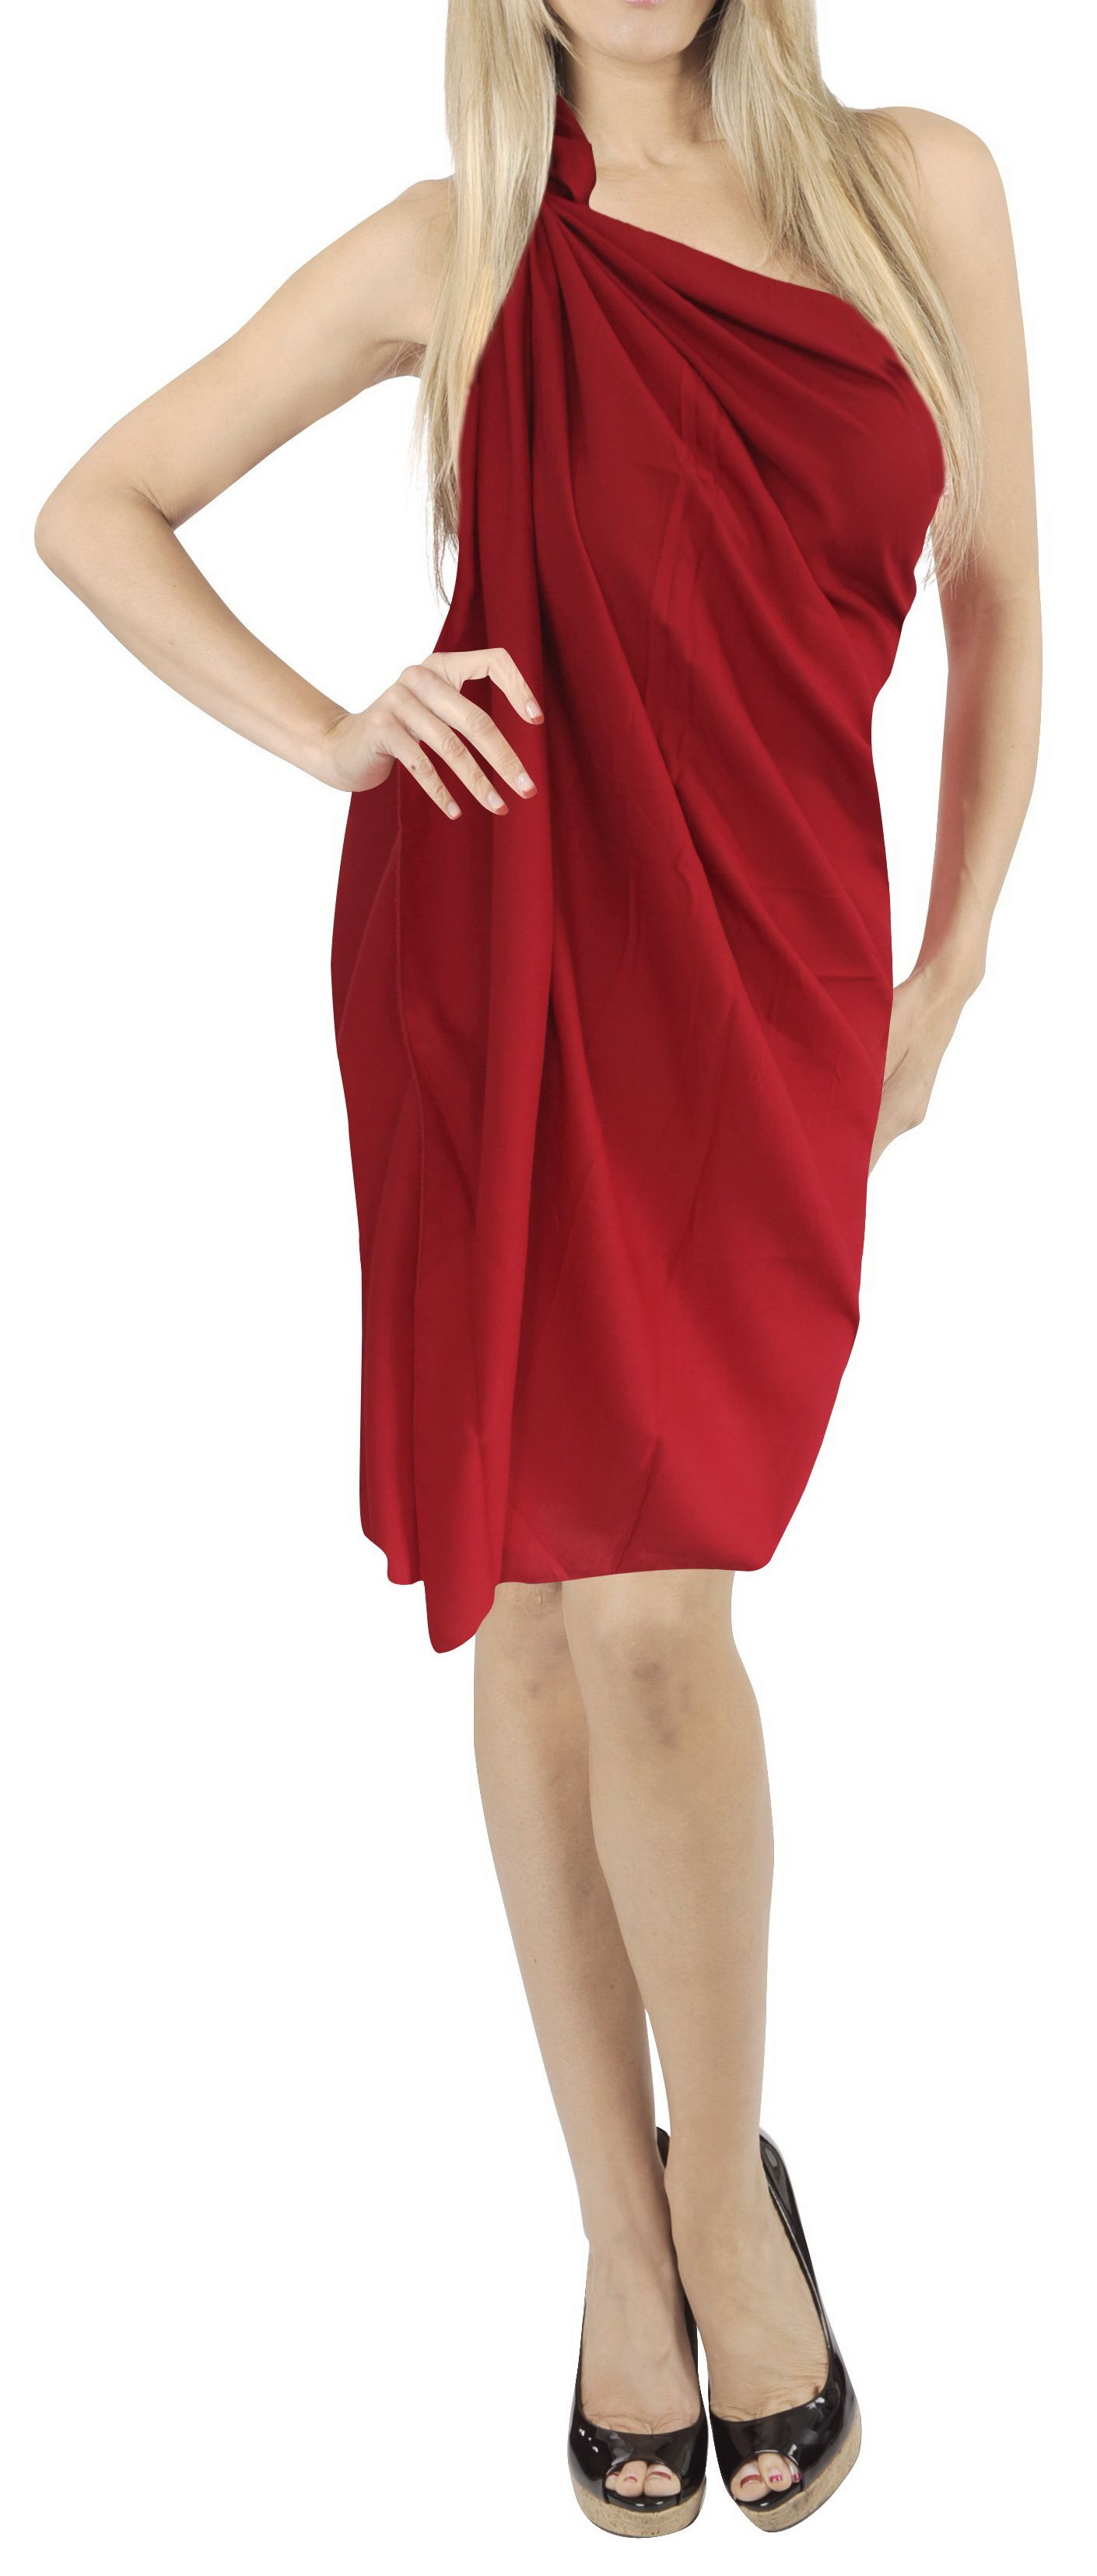 44e3cae681811 Sarong Wrap Beachwear Bathing Suit Swimwear Swimsuit Cover ups Pareo Skirt  Women#Bathing, #Suit, #Swimwear